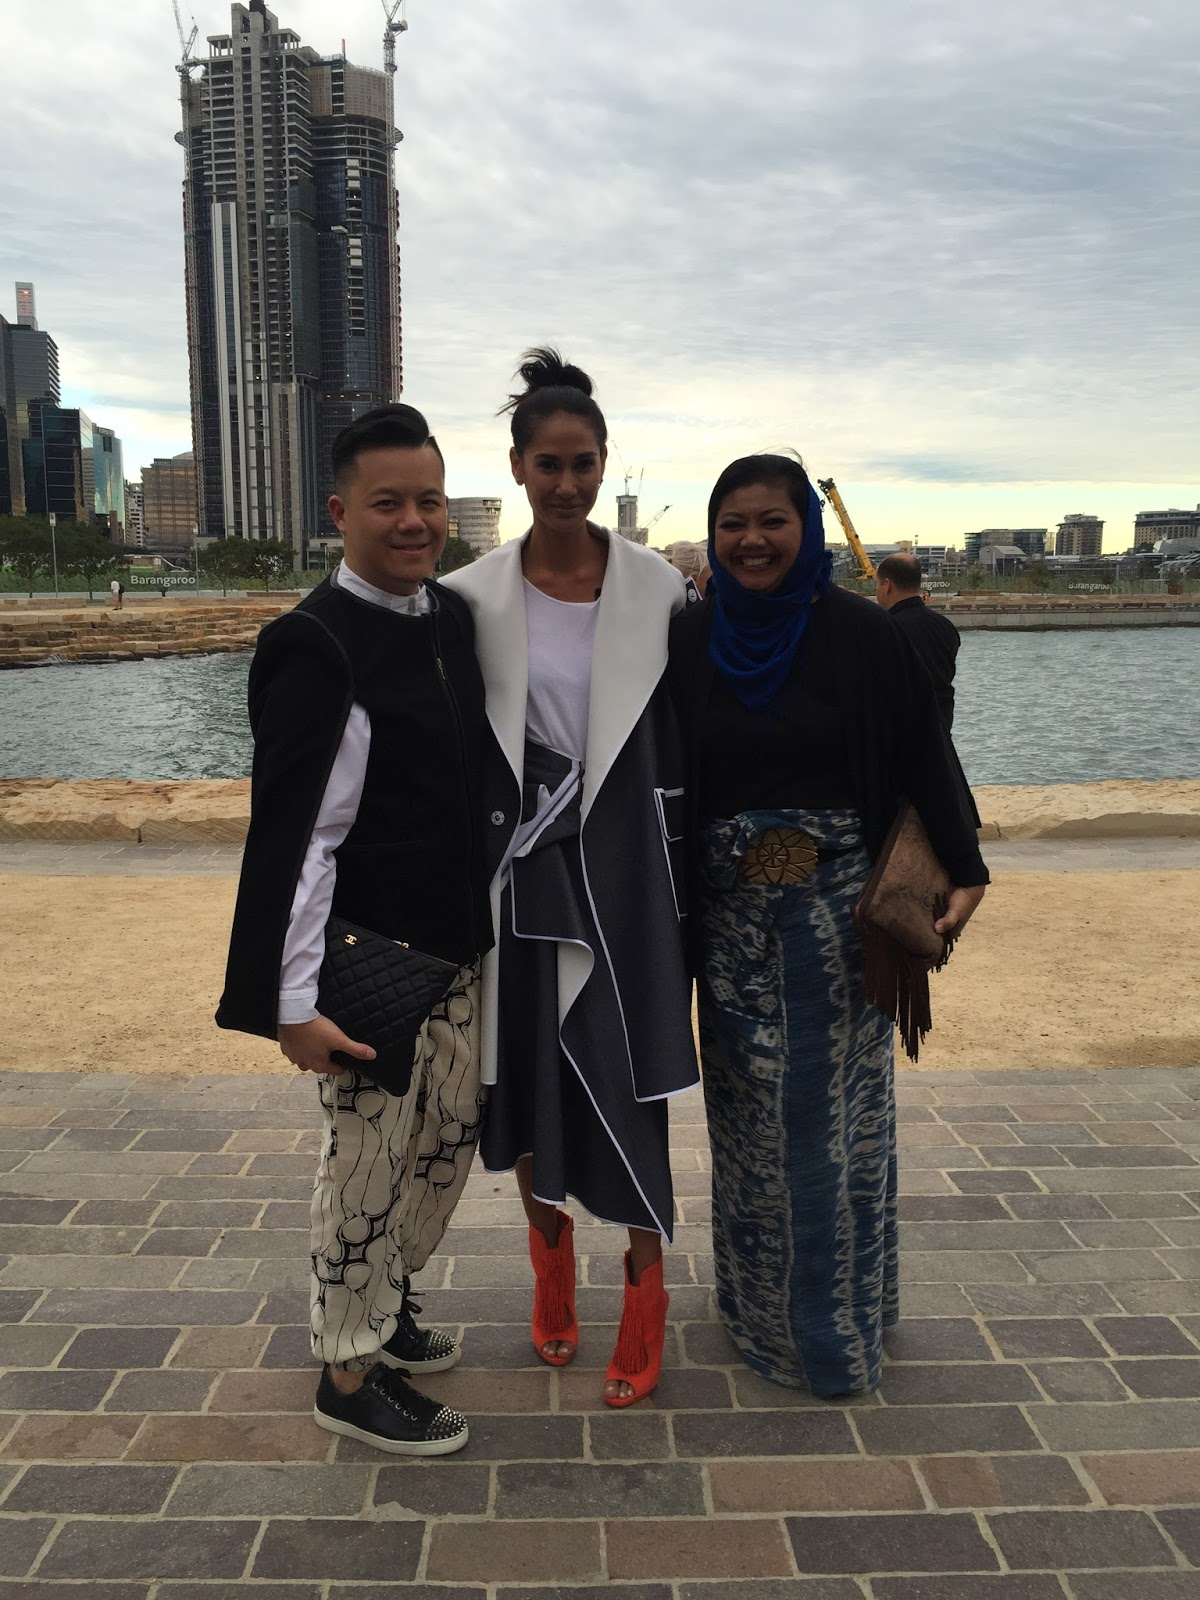 Hello Lindy Klim Ms Klim is a beloved fashion figure in Australian scene